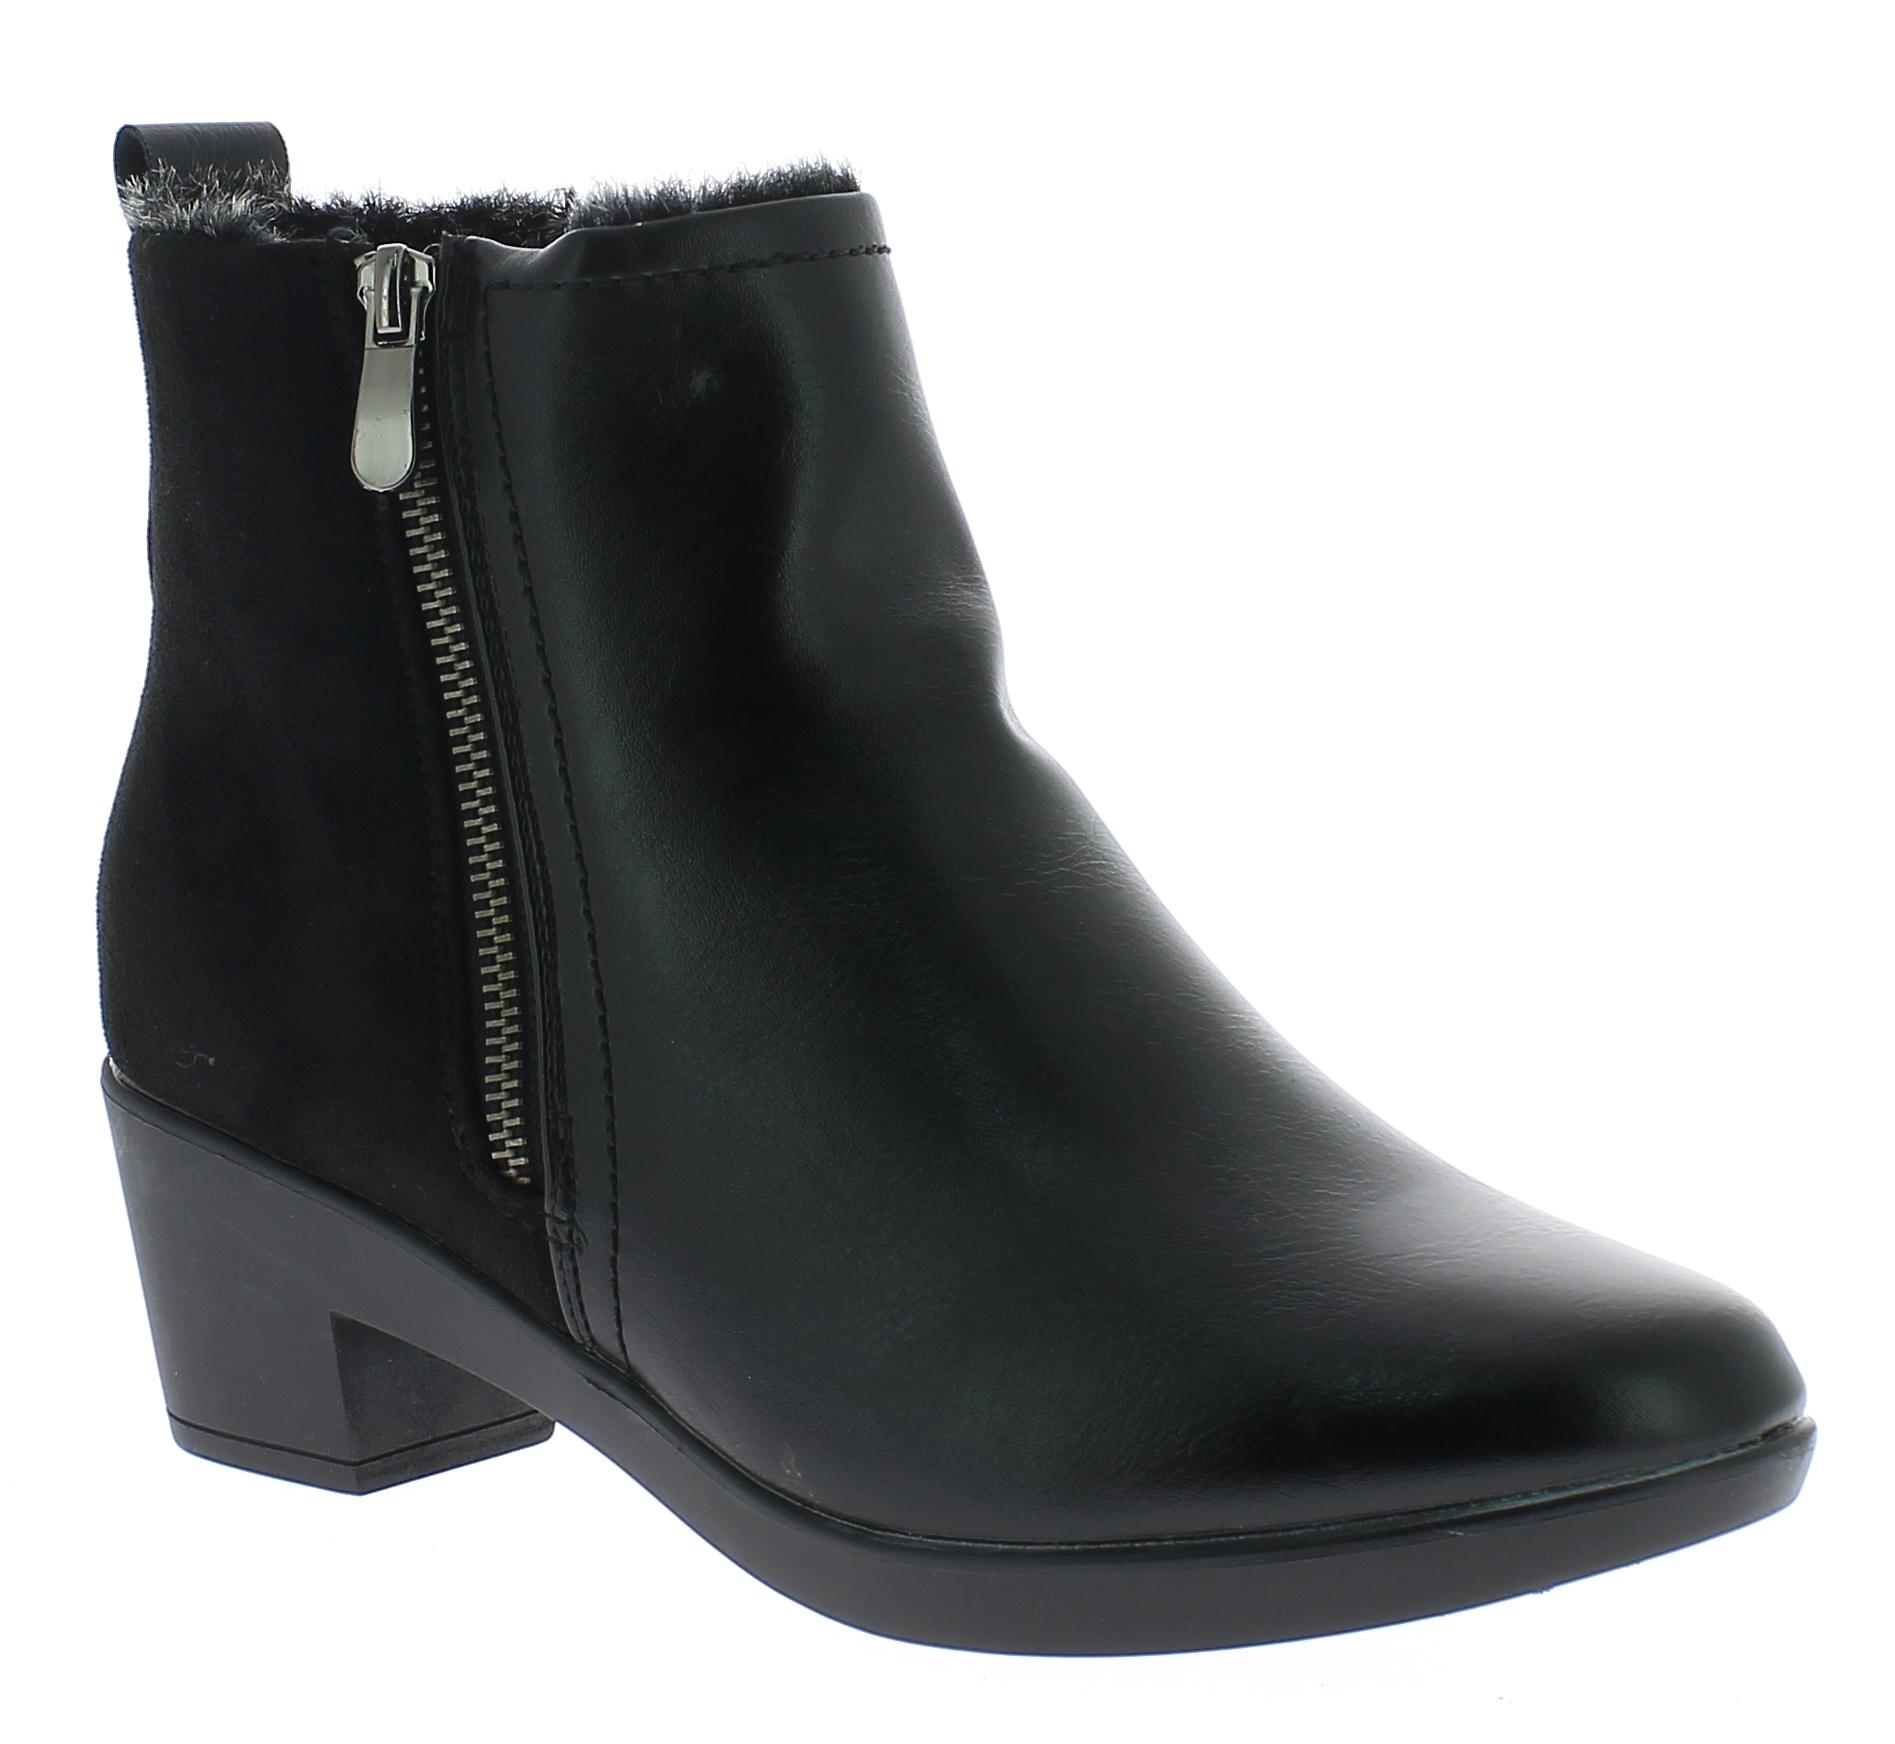 AMARPIES Γυναικείο Μποτάκι AKT9835 Μαύρο - IqShoes - AKT9835 BLACK-black-38/1/15 παπούτσια  γυναικεία μποτάκια